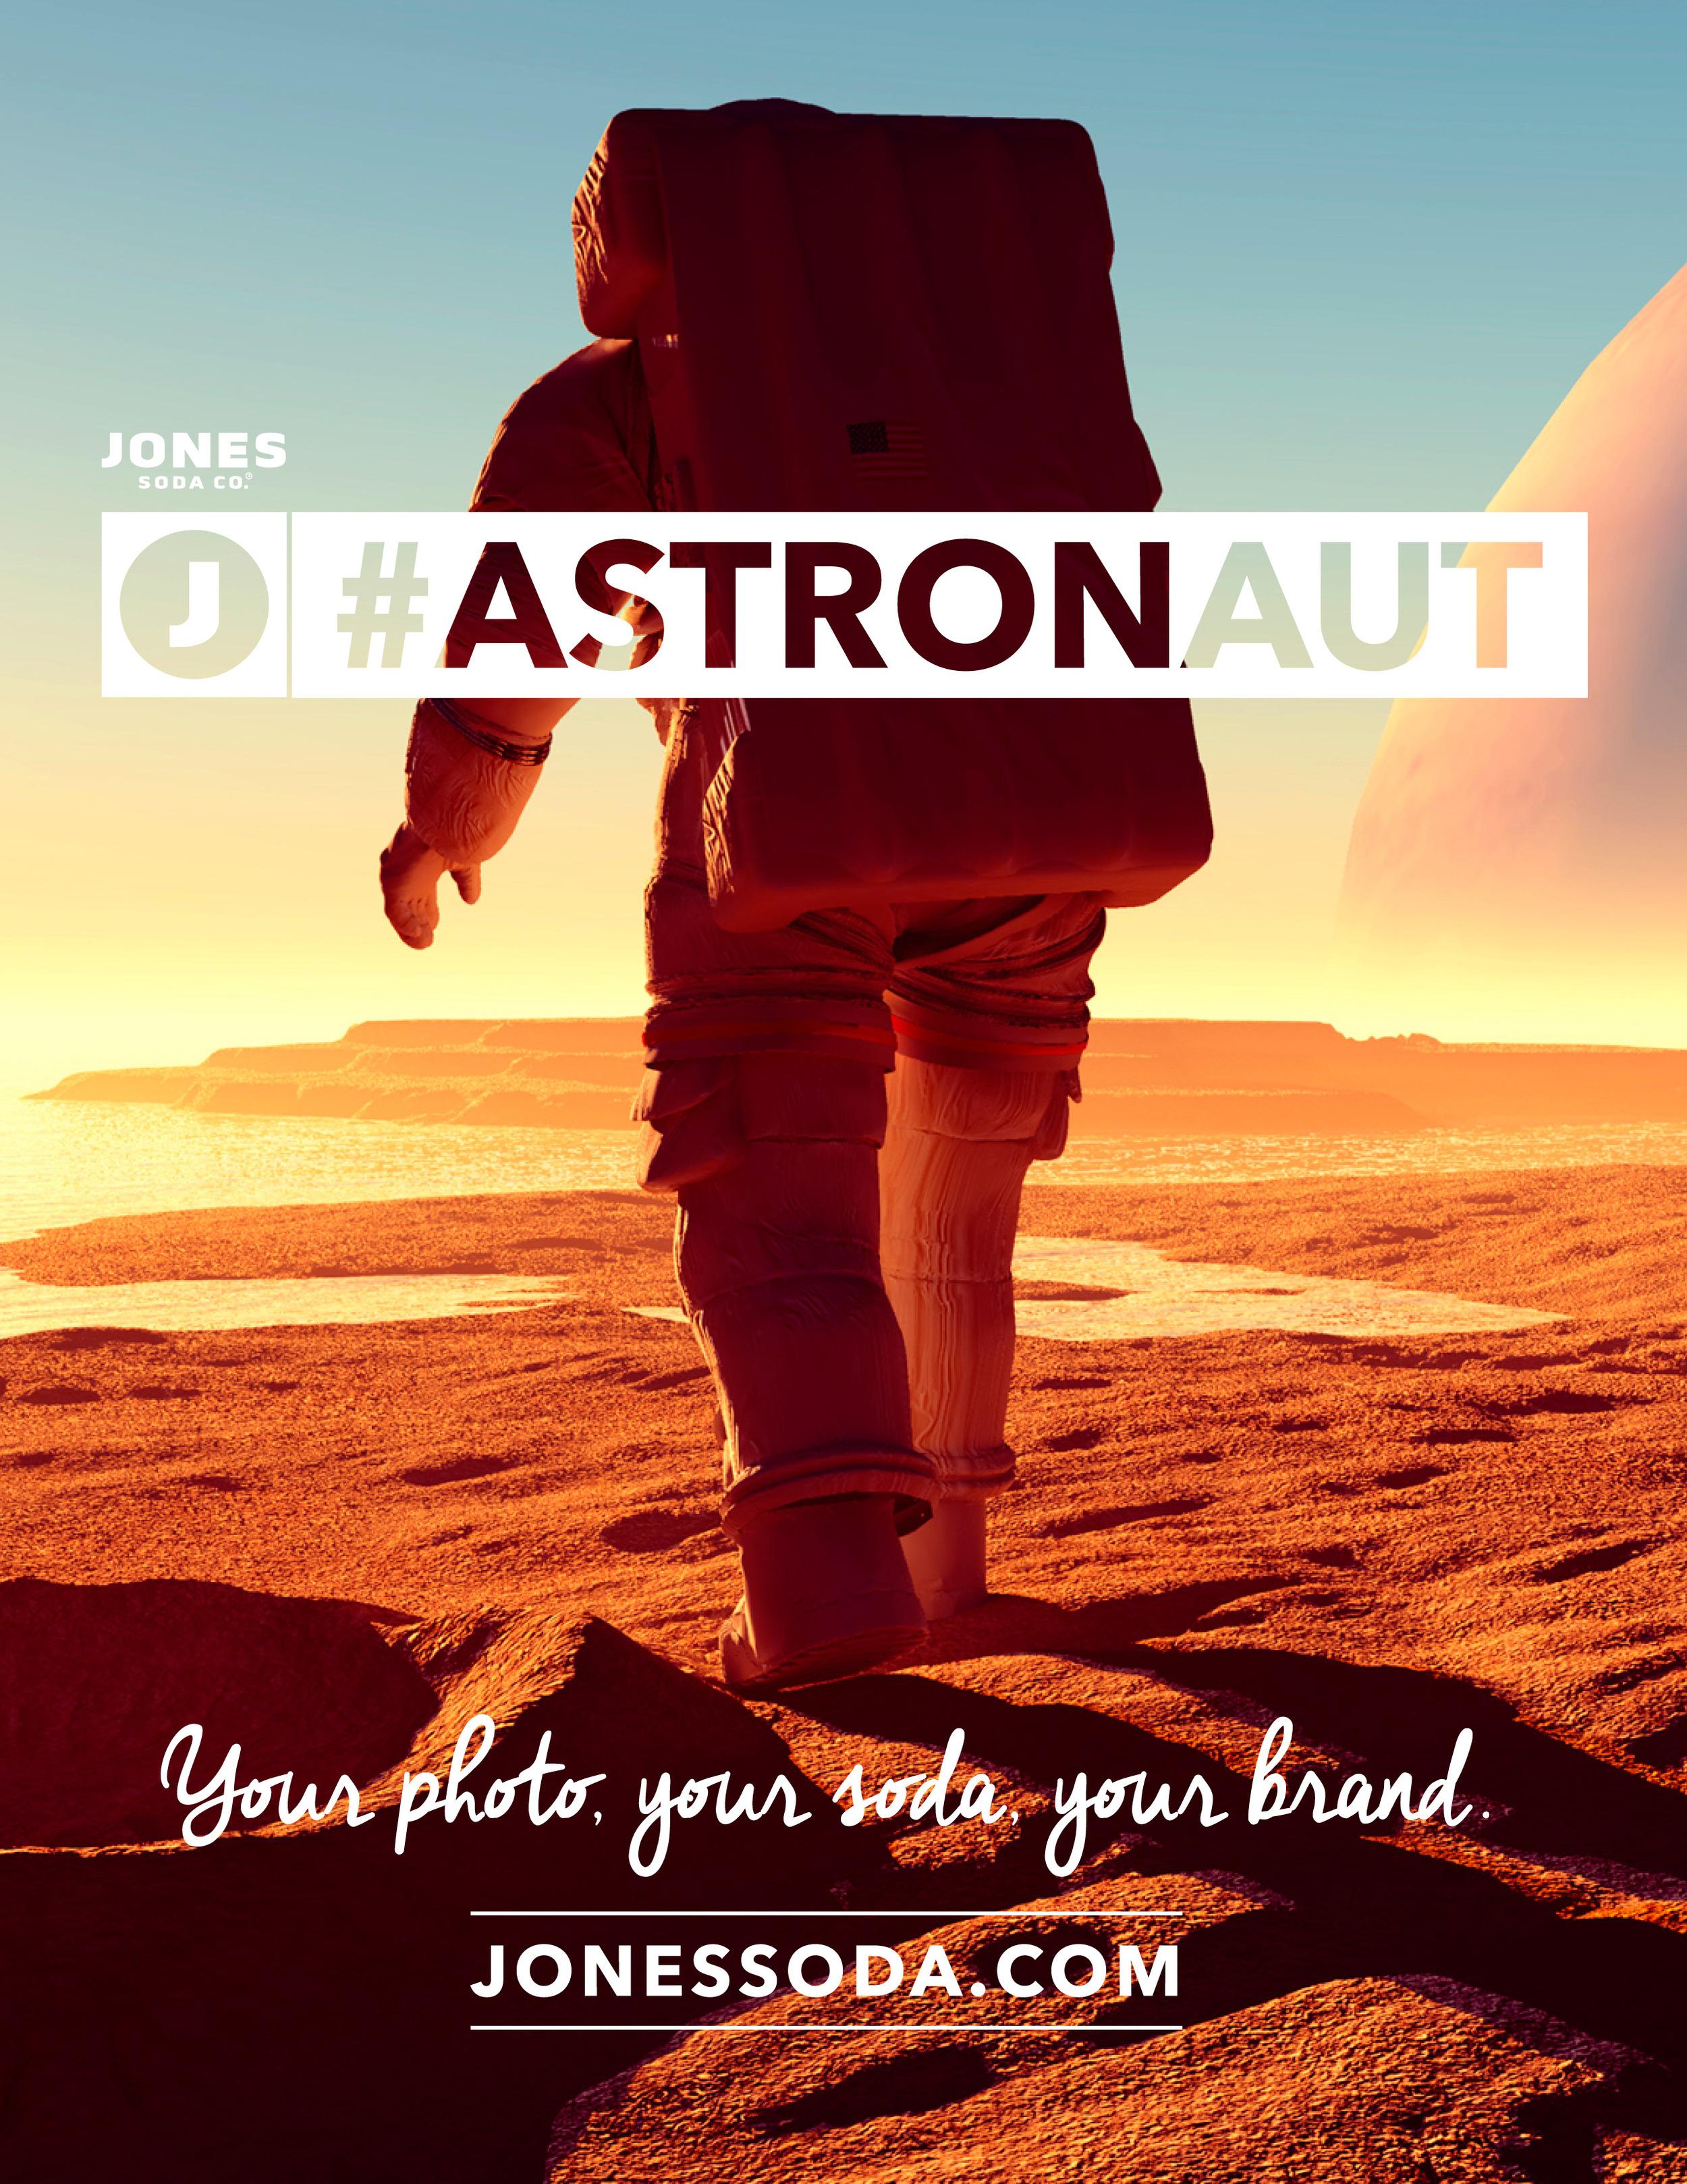 Jones_Street Sign_Astronaut_web.jpg